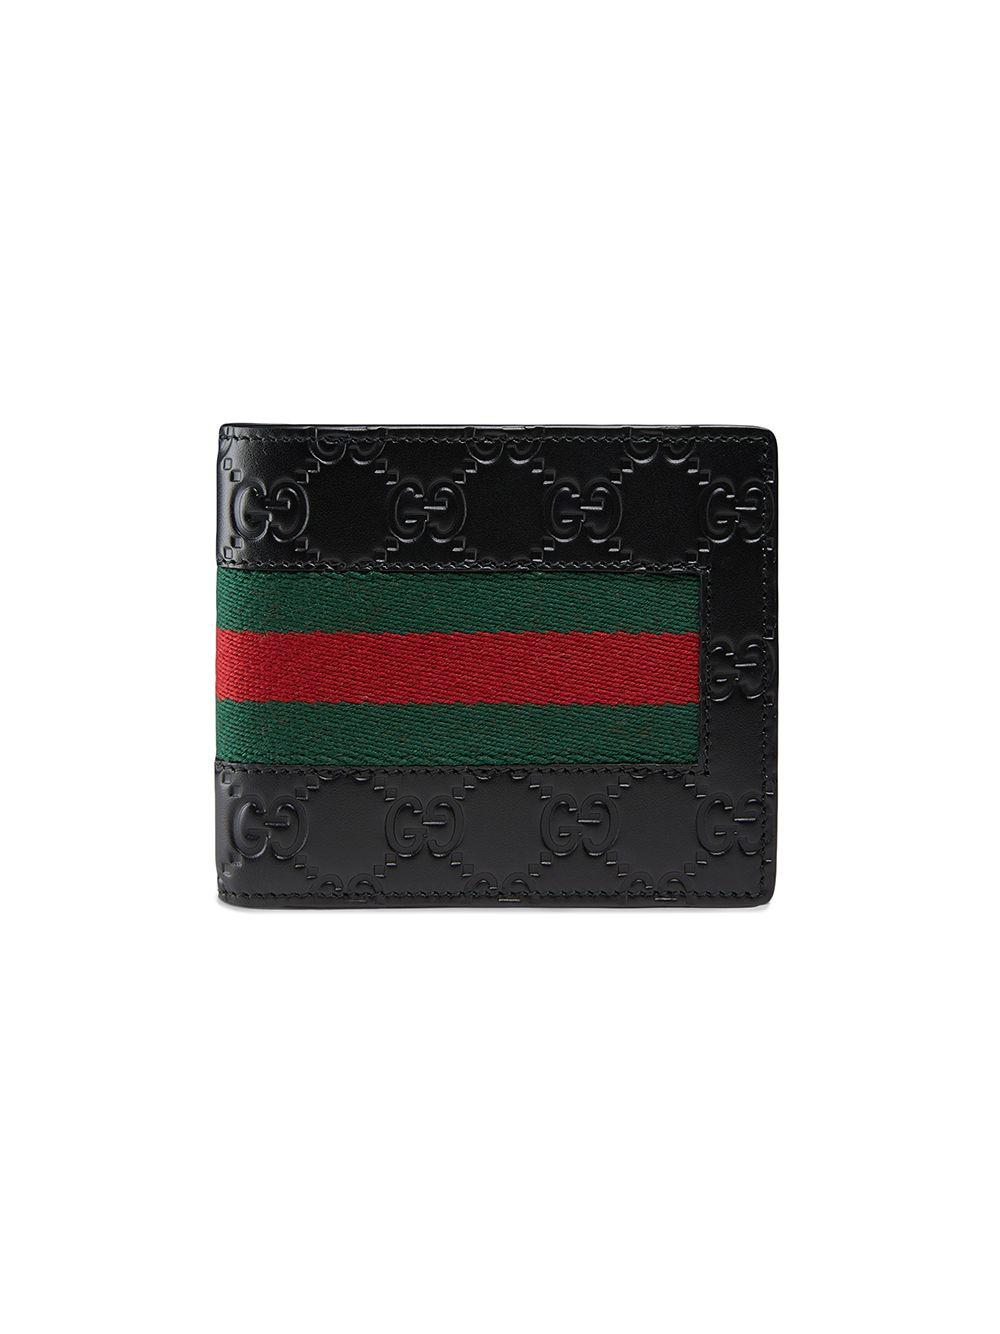 f3a1b4adea8b Gucci Signature Web Wallet With Id Window In Black | ModeSens